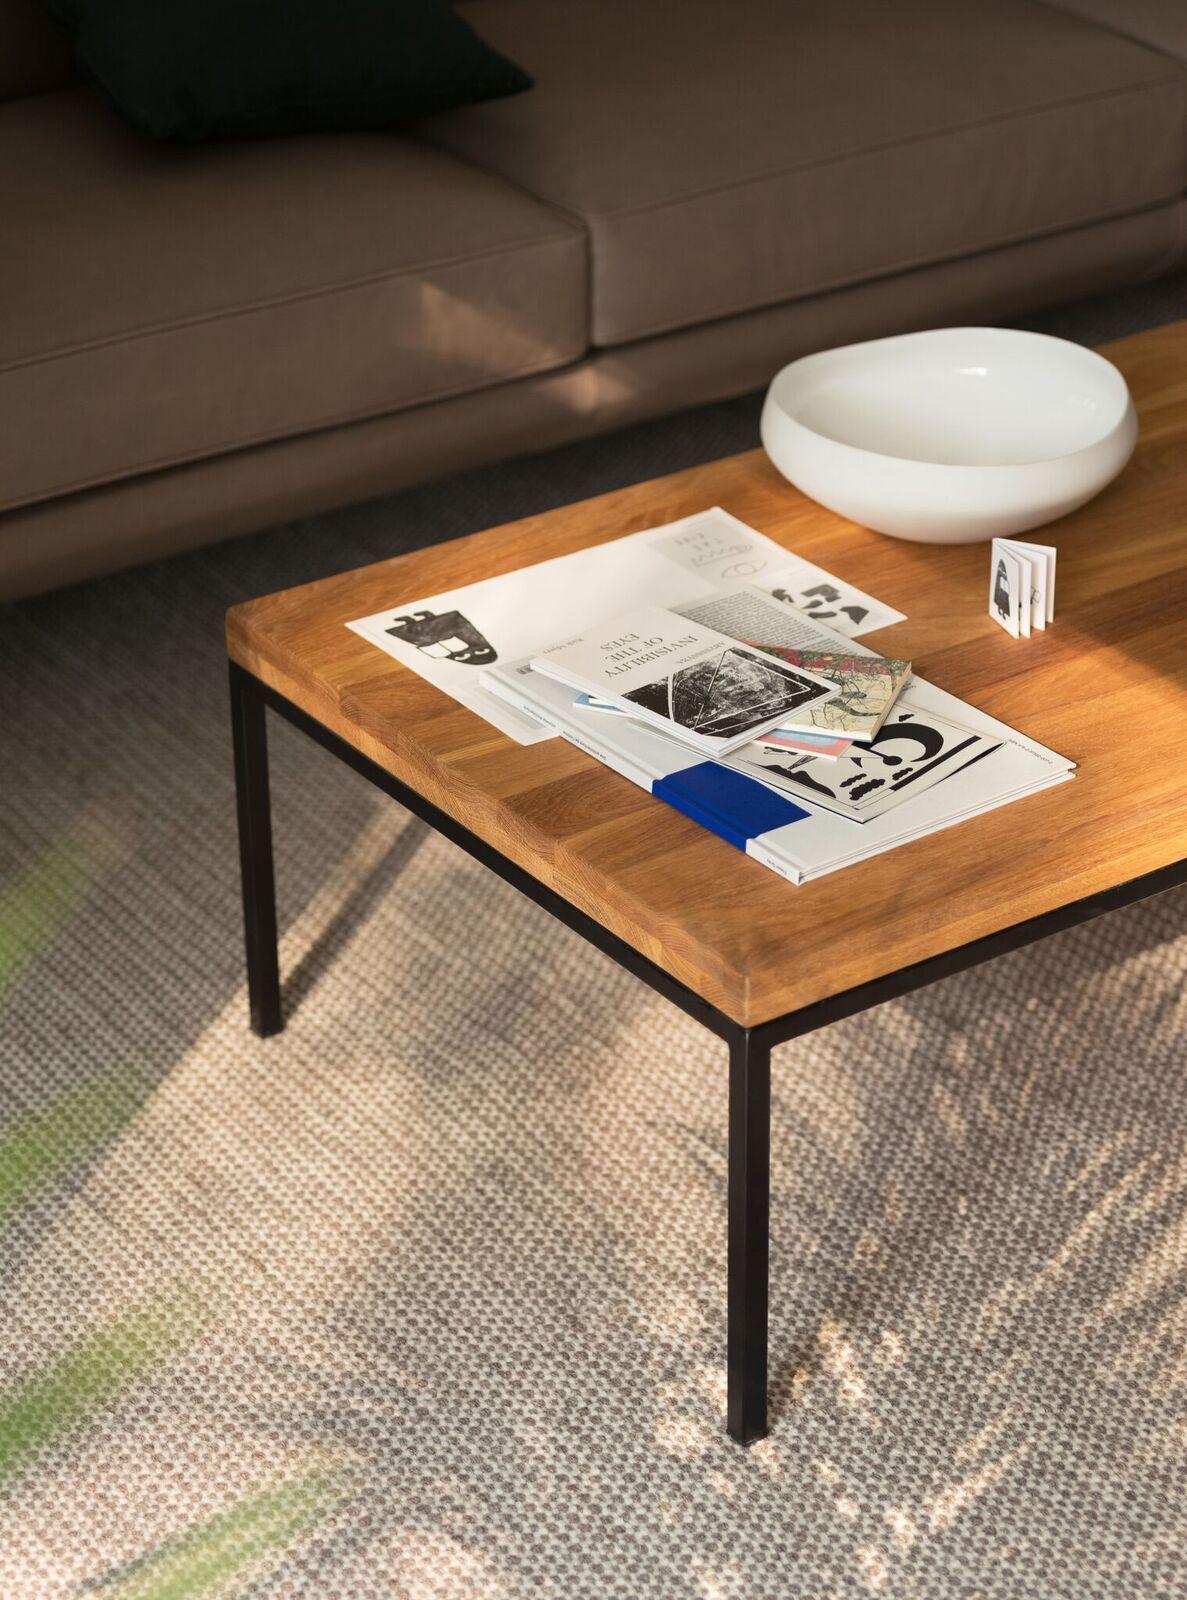 Custom Coffee Table 24 X 42 Eq3 Custom Coffee Table Coffee Table Coffee Table Size [ 1600 x 1187 Pixel ]